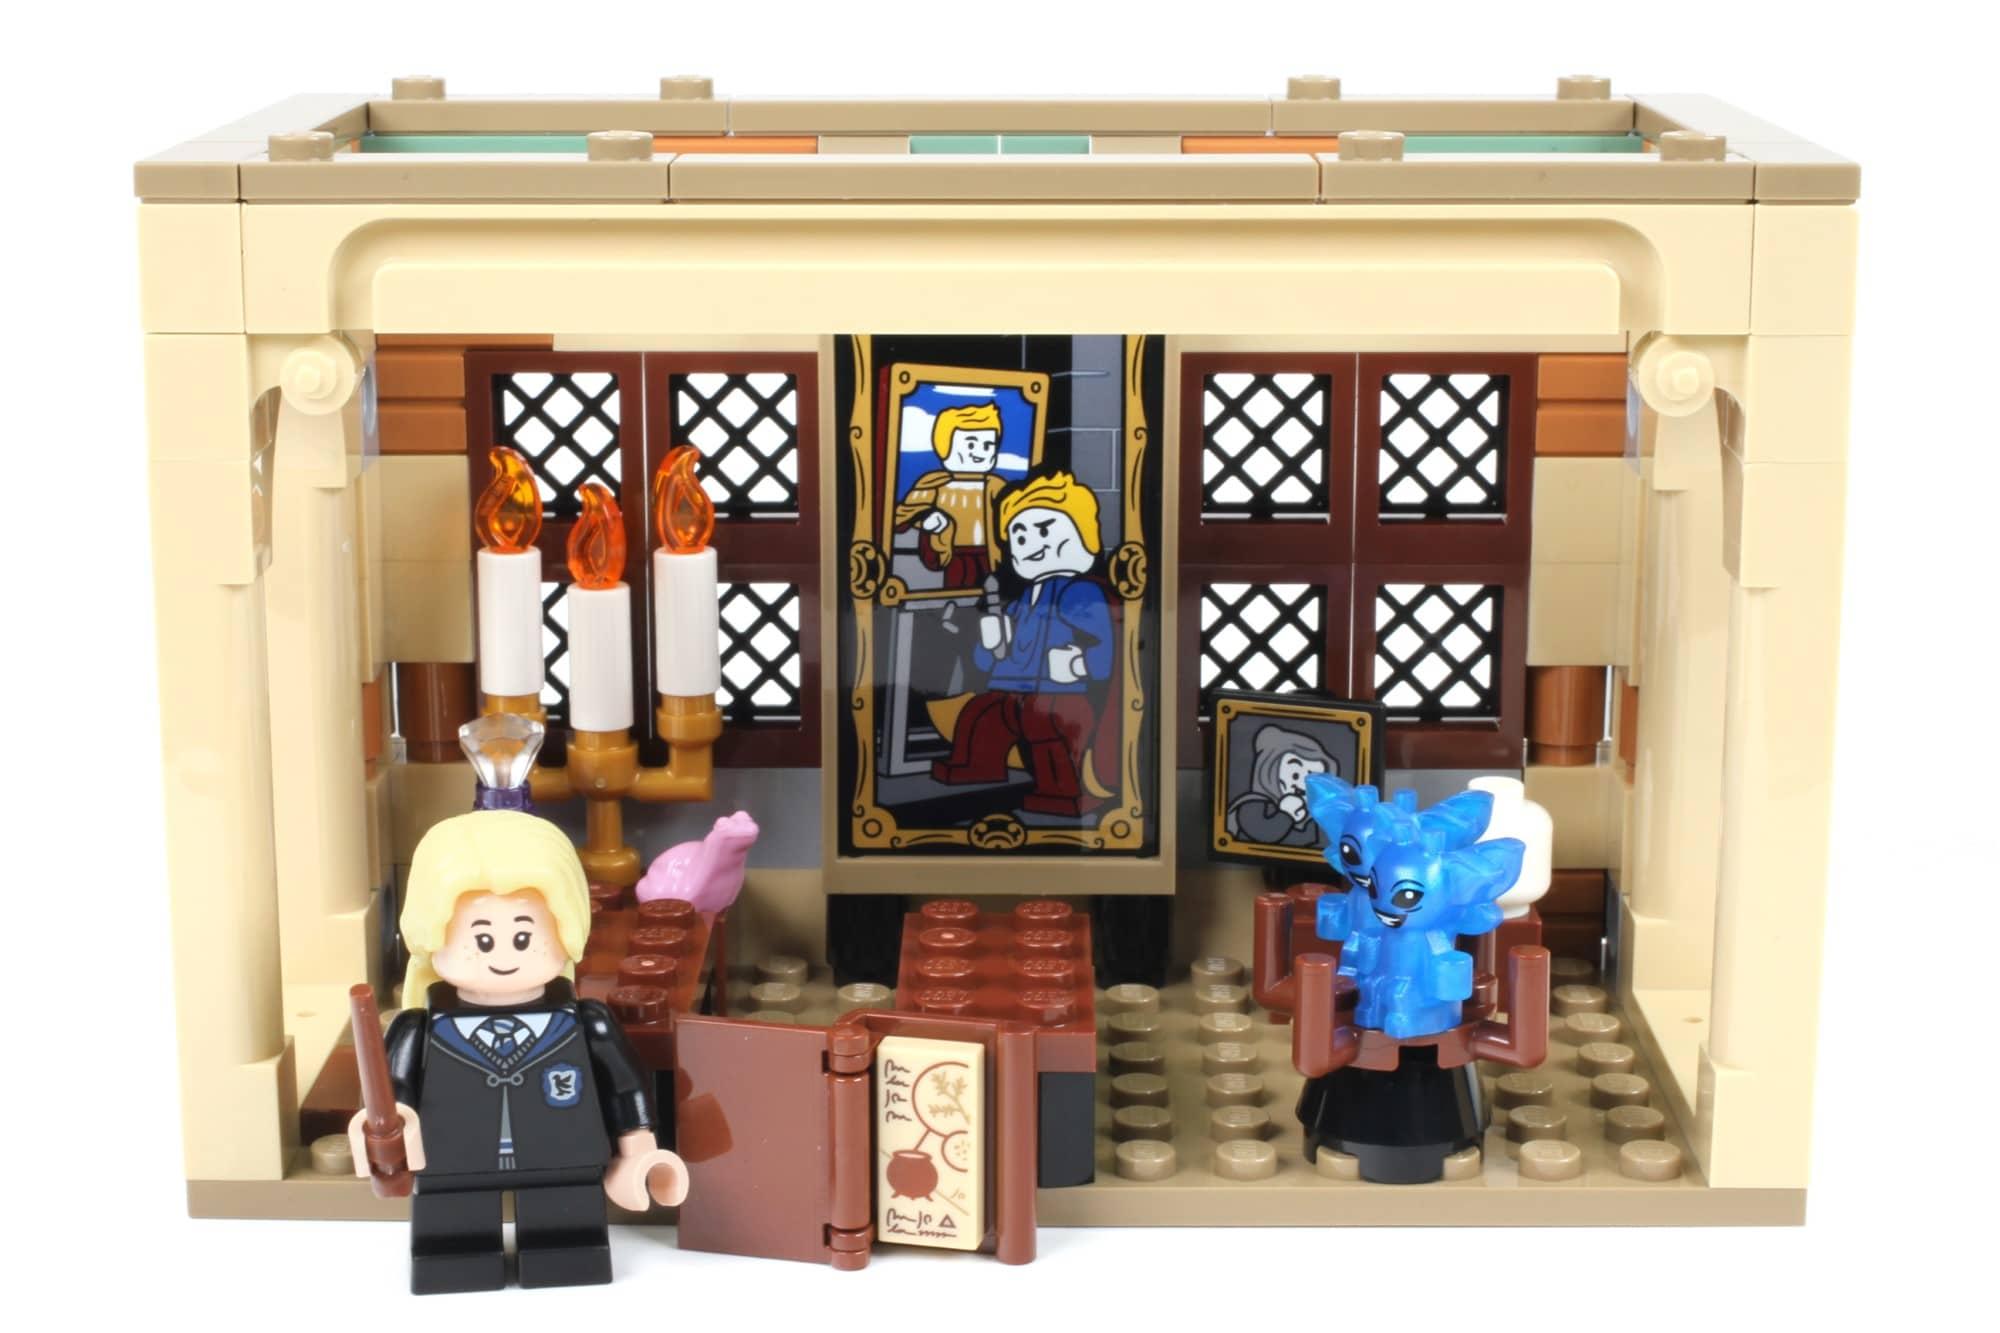 LEGO Harry Potter 76389 Hogwarts Kammer Des Schreckens Schritt 2 2